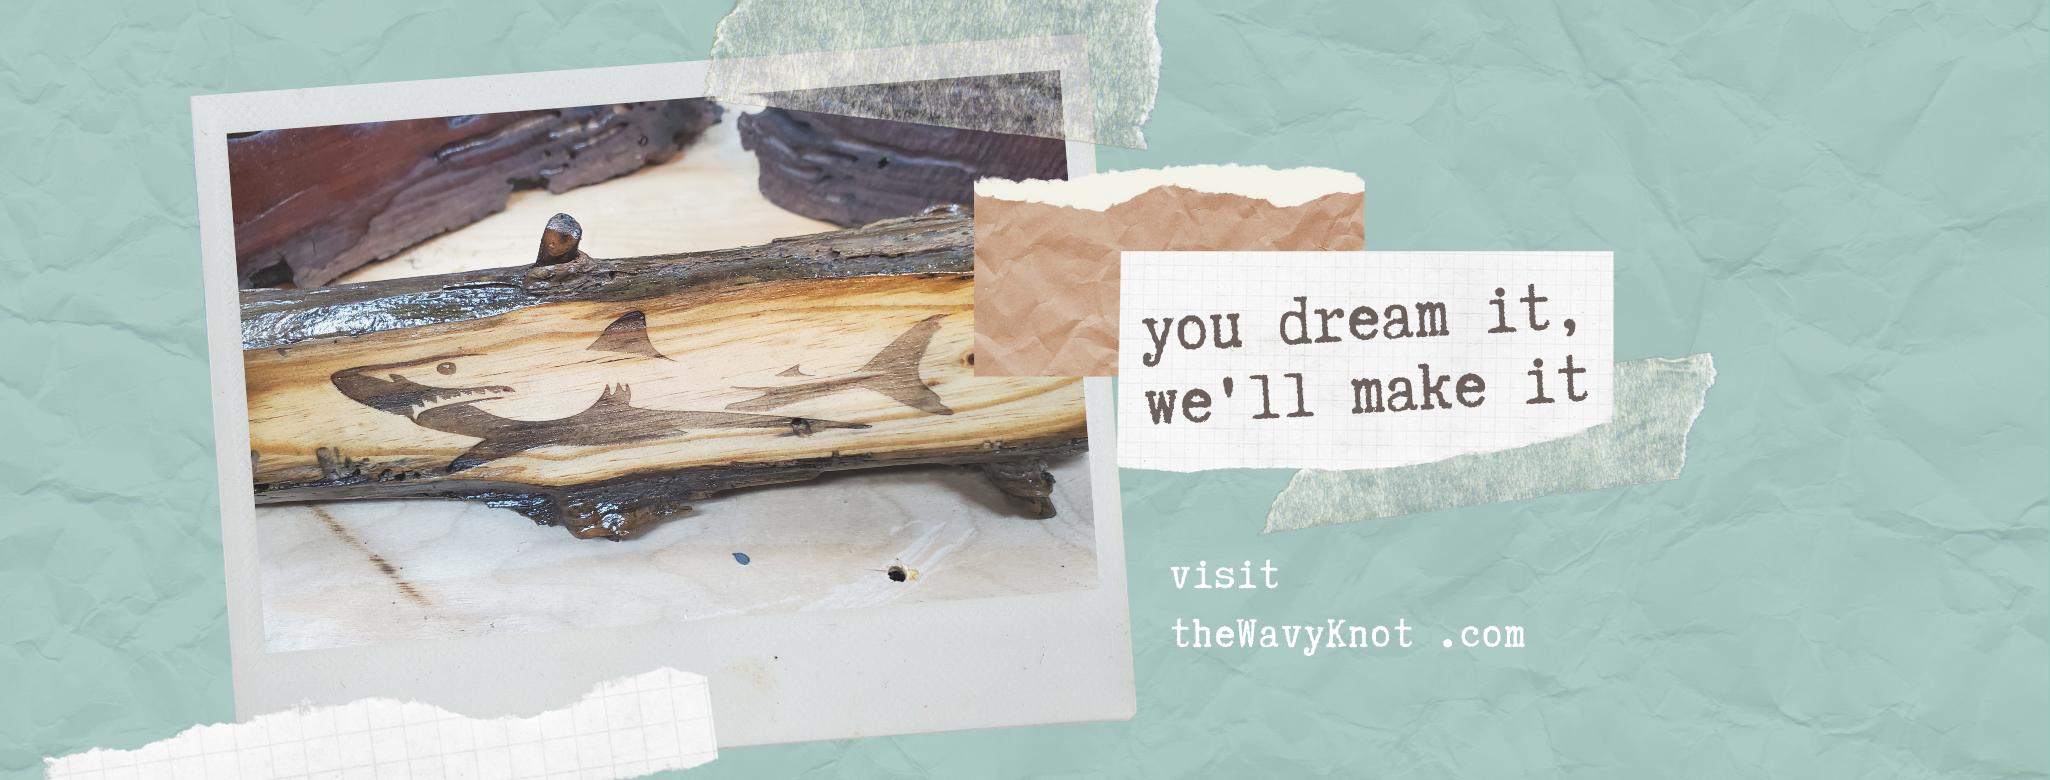 you dream it, we'll make it